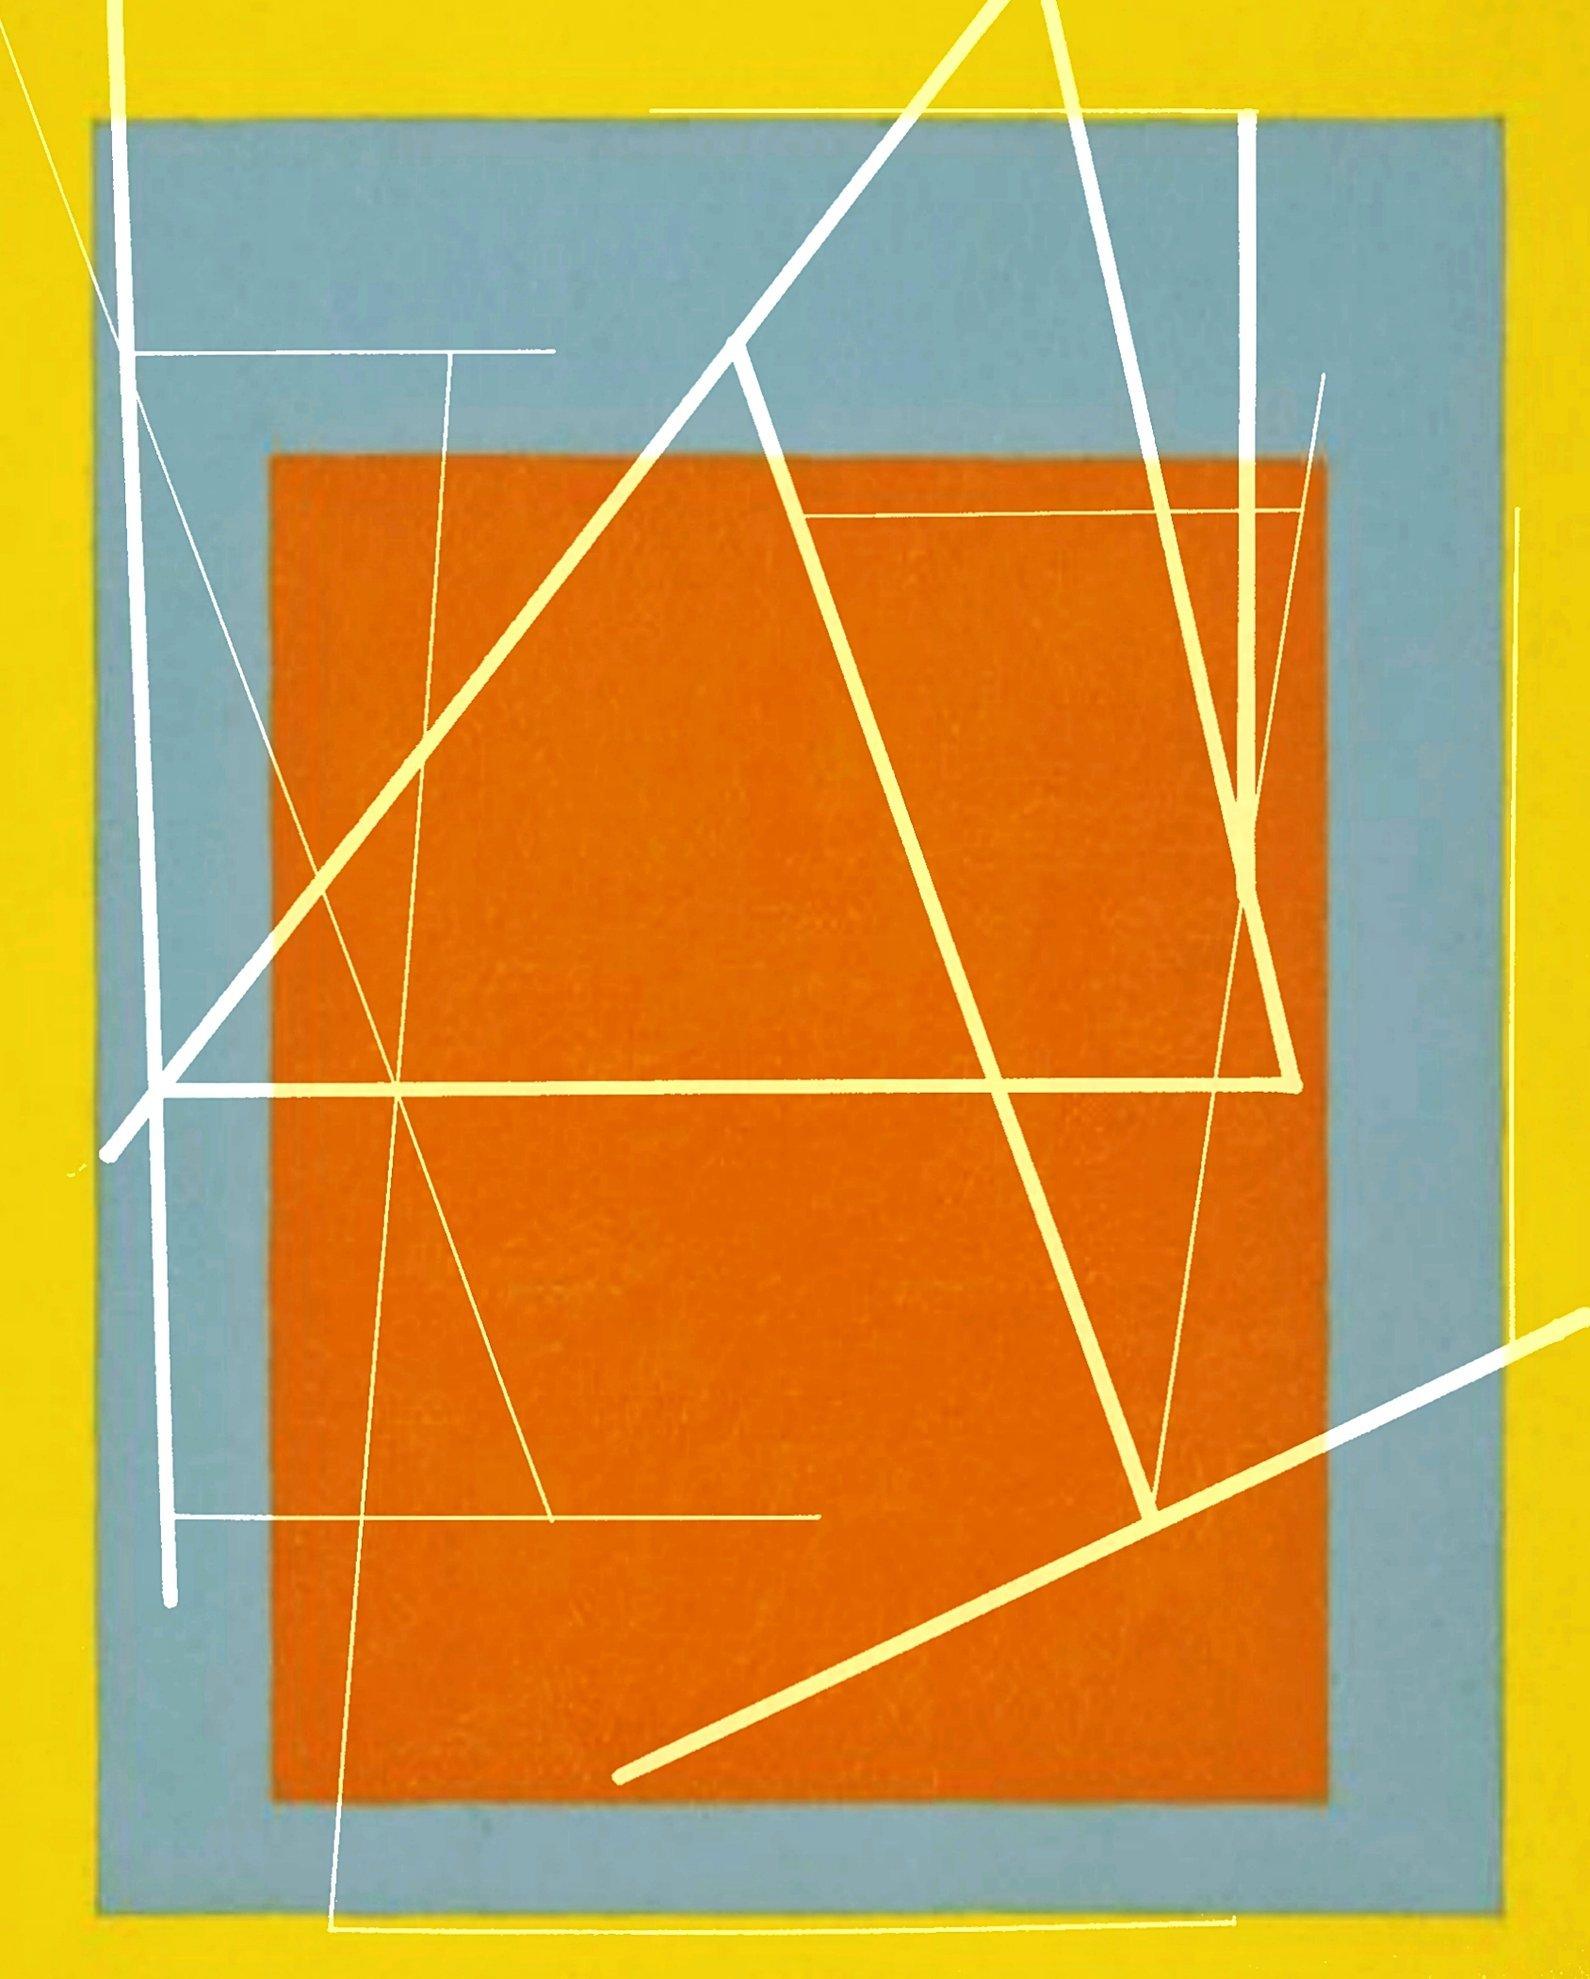 IMG_5610 merge AHS orange.jpg